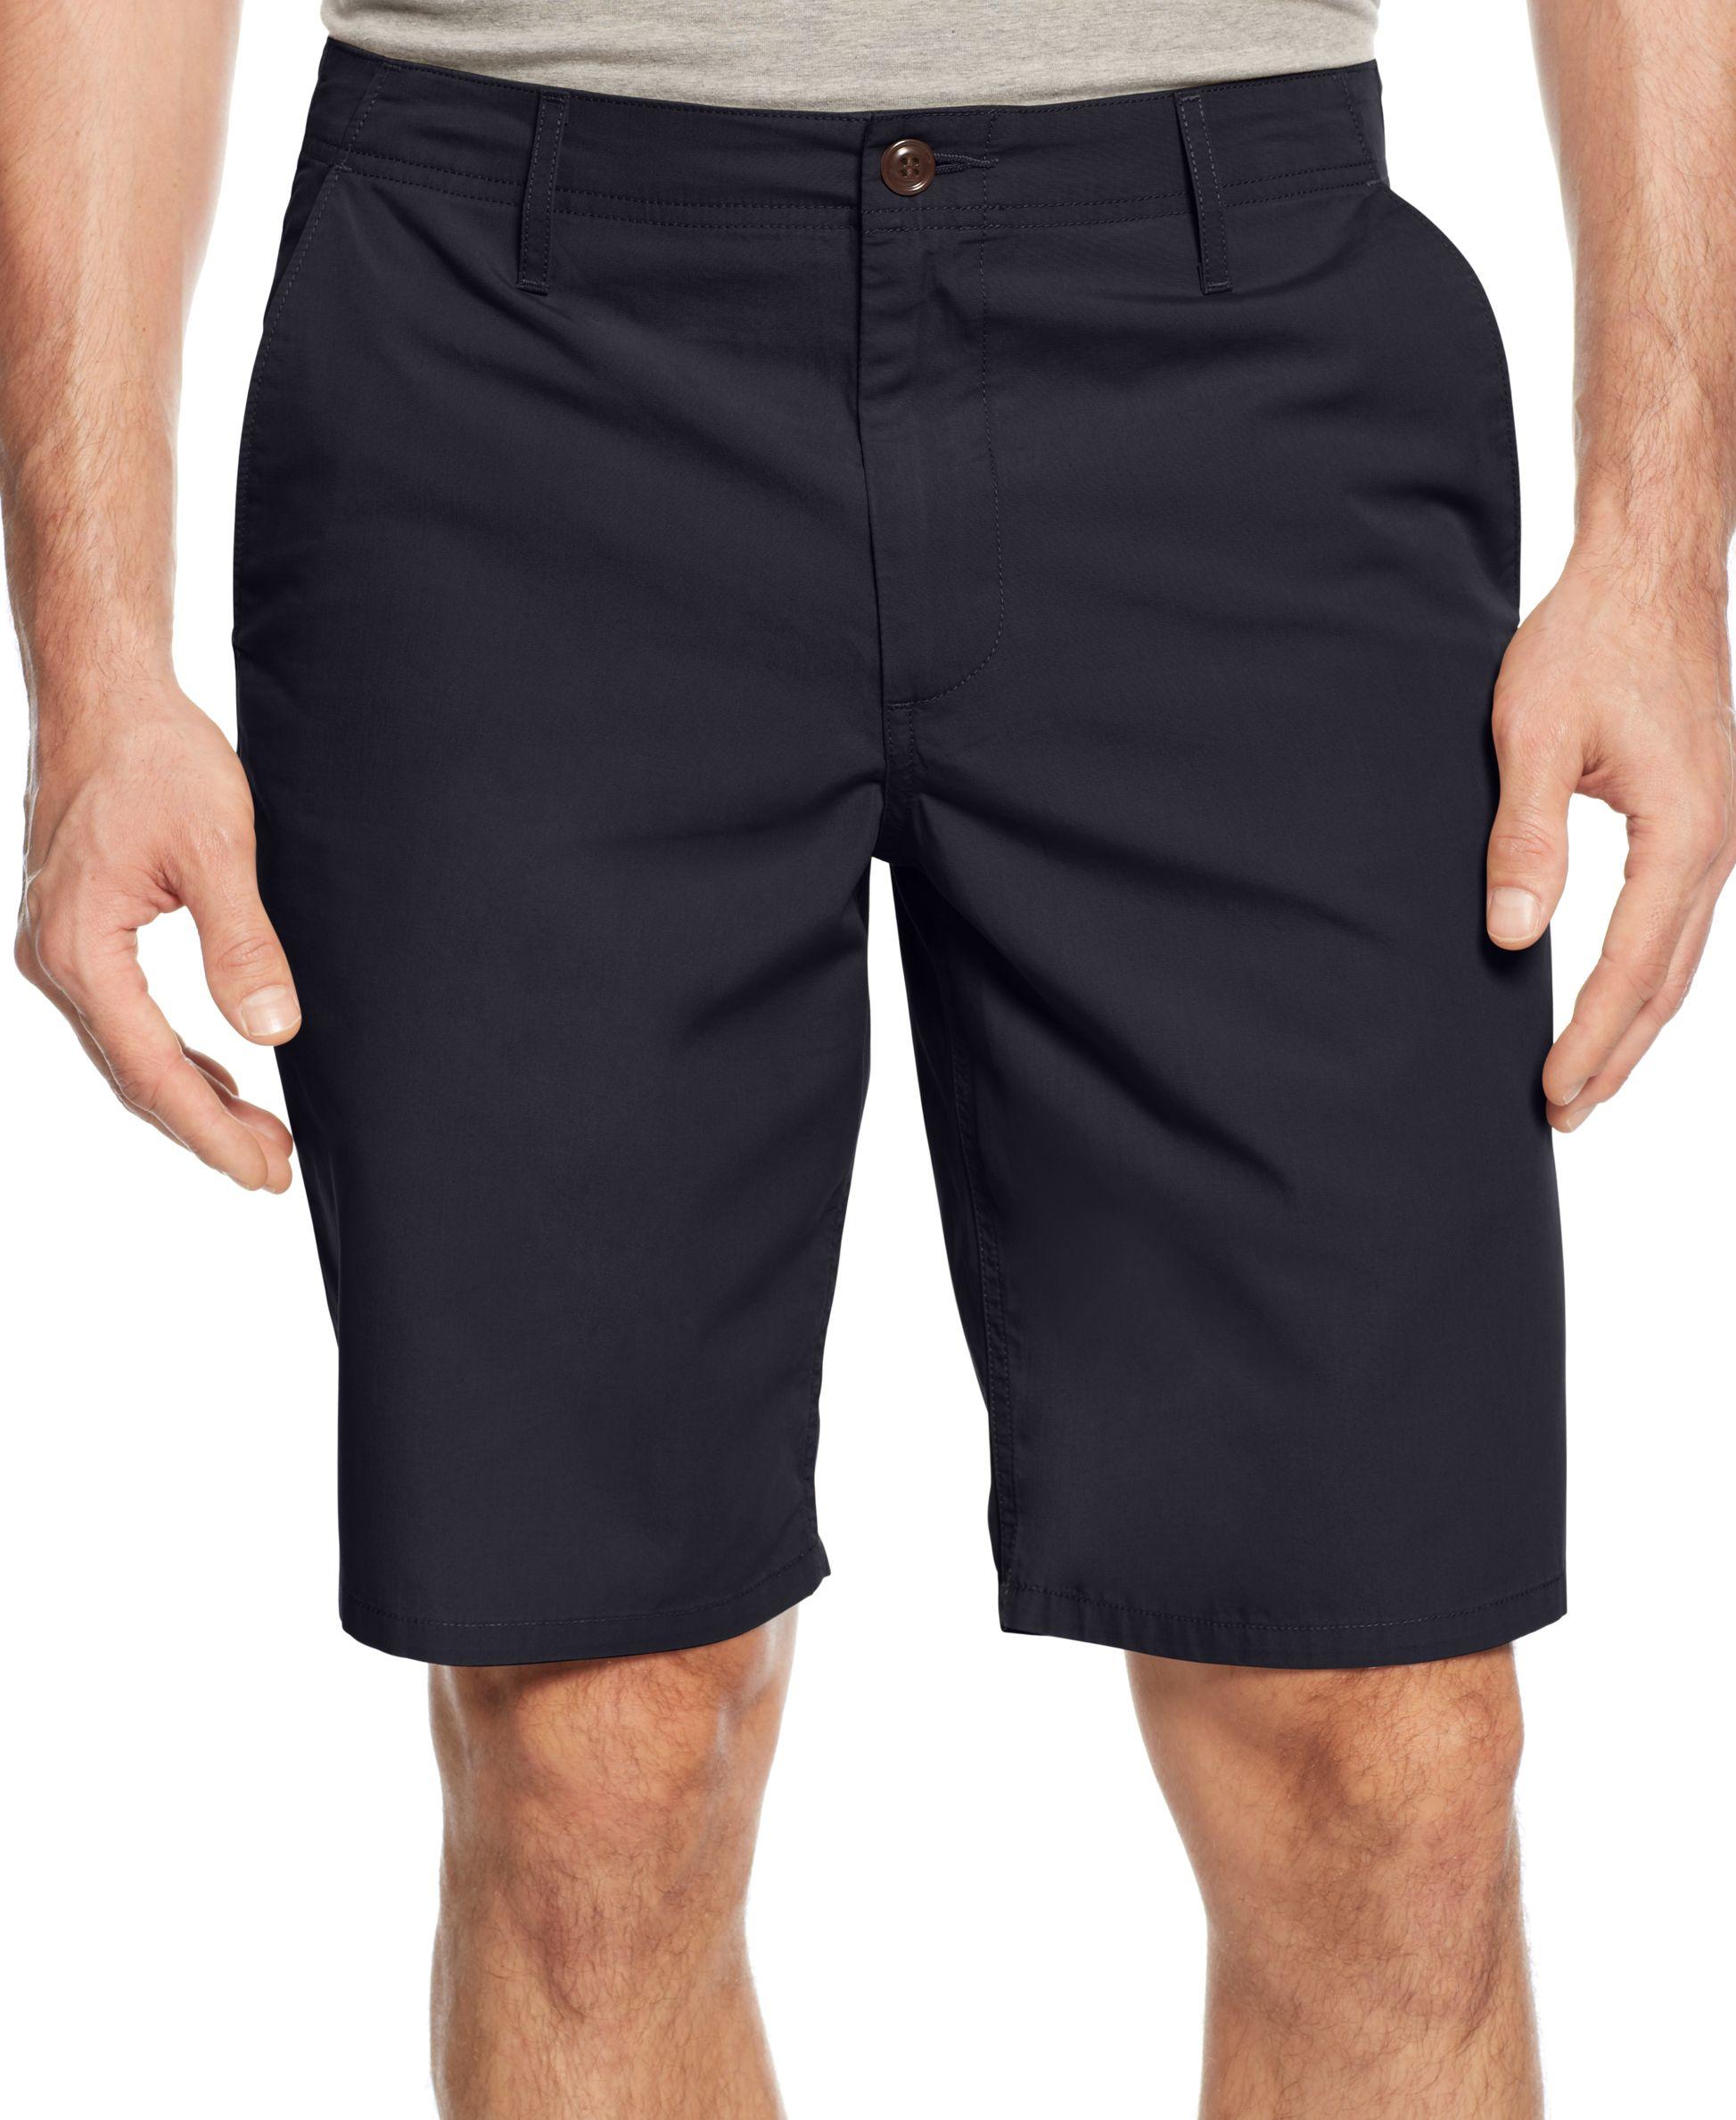 f7845aace5 DOCKERS Straight Fit Poplin Shorts 33 Flat Front Navy Blue | eBay